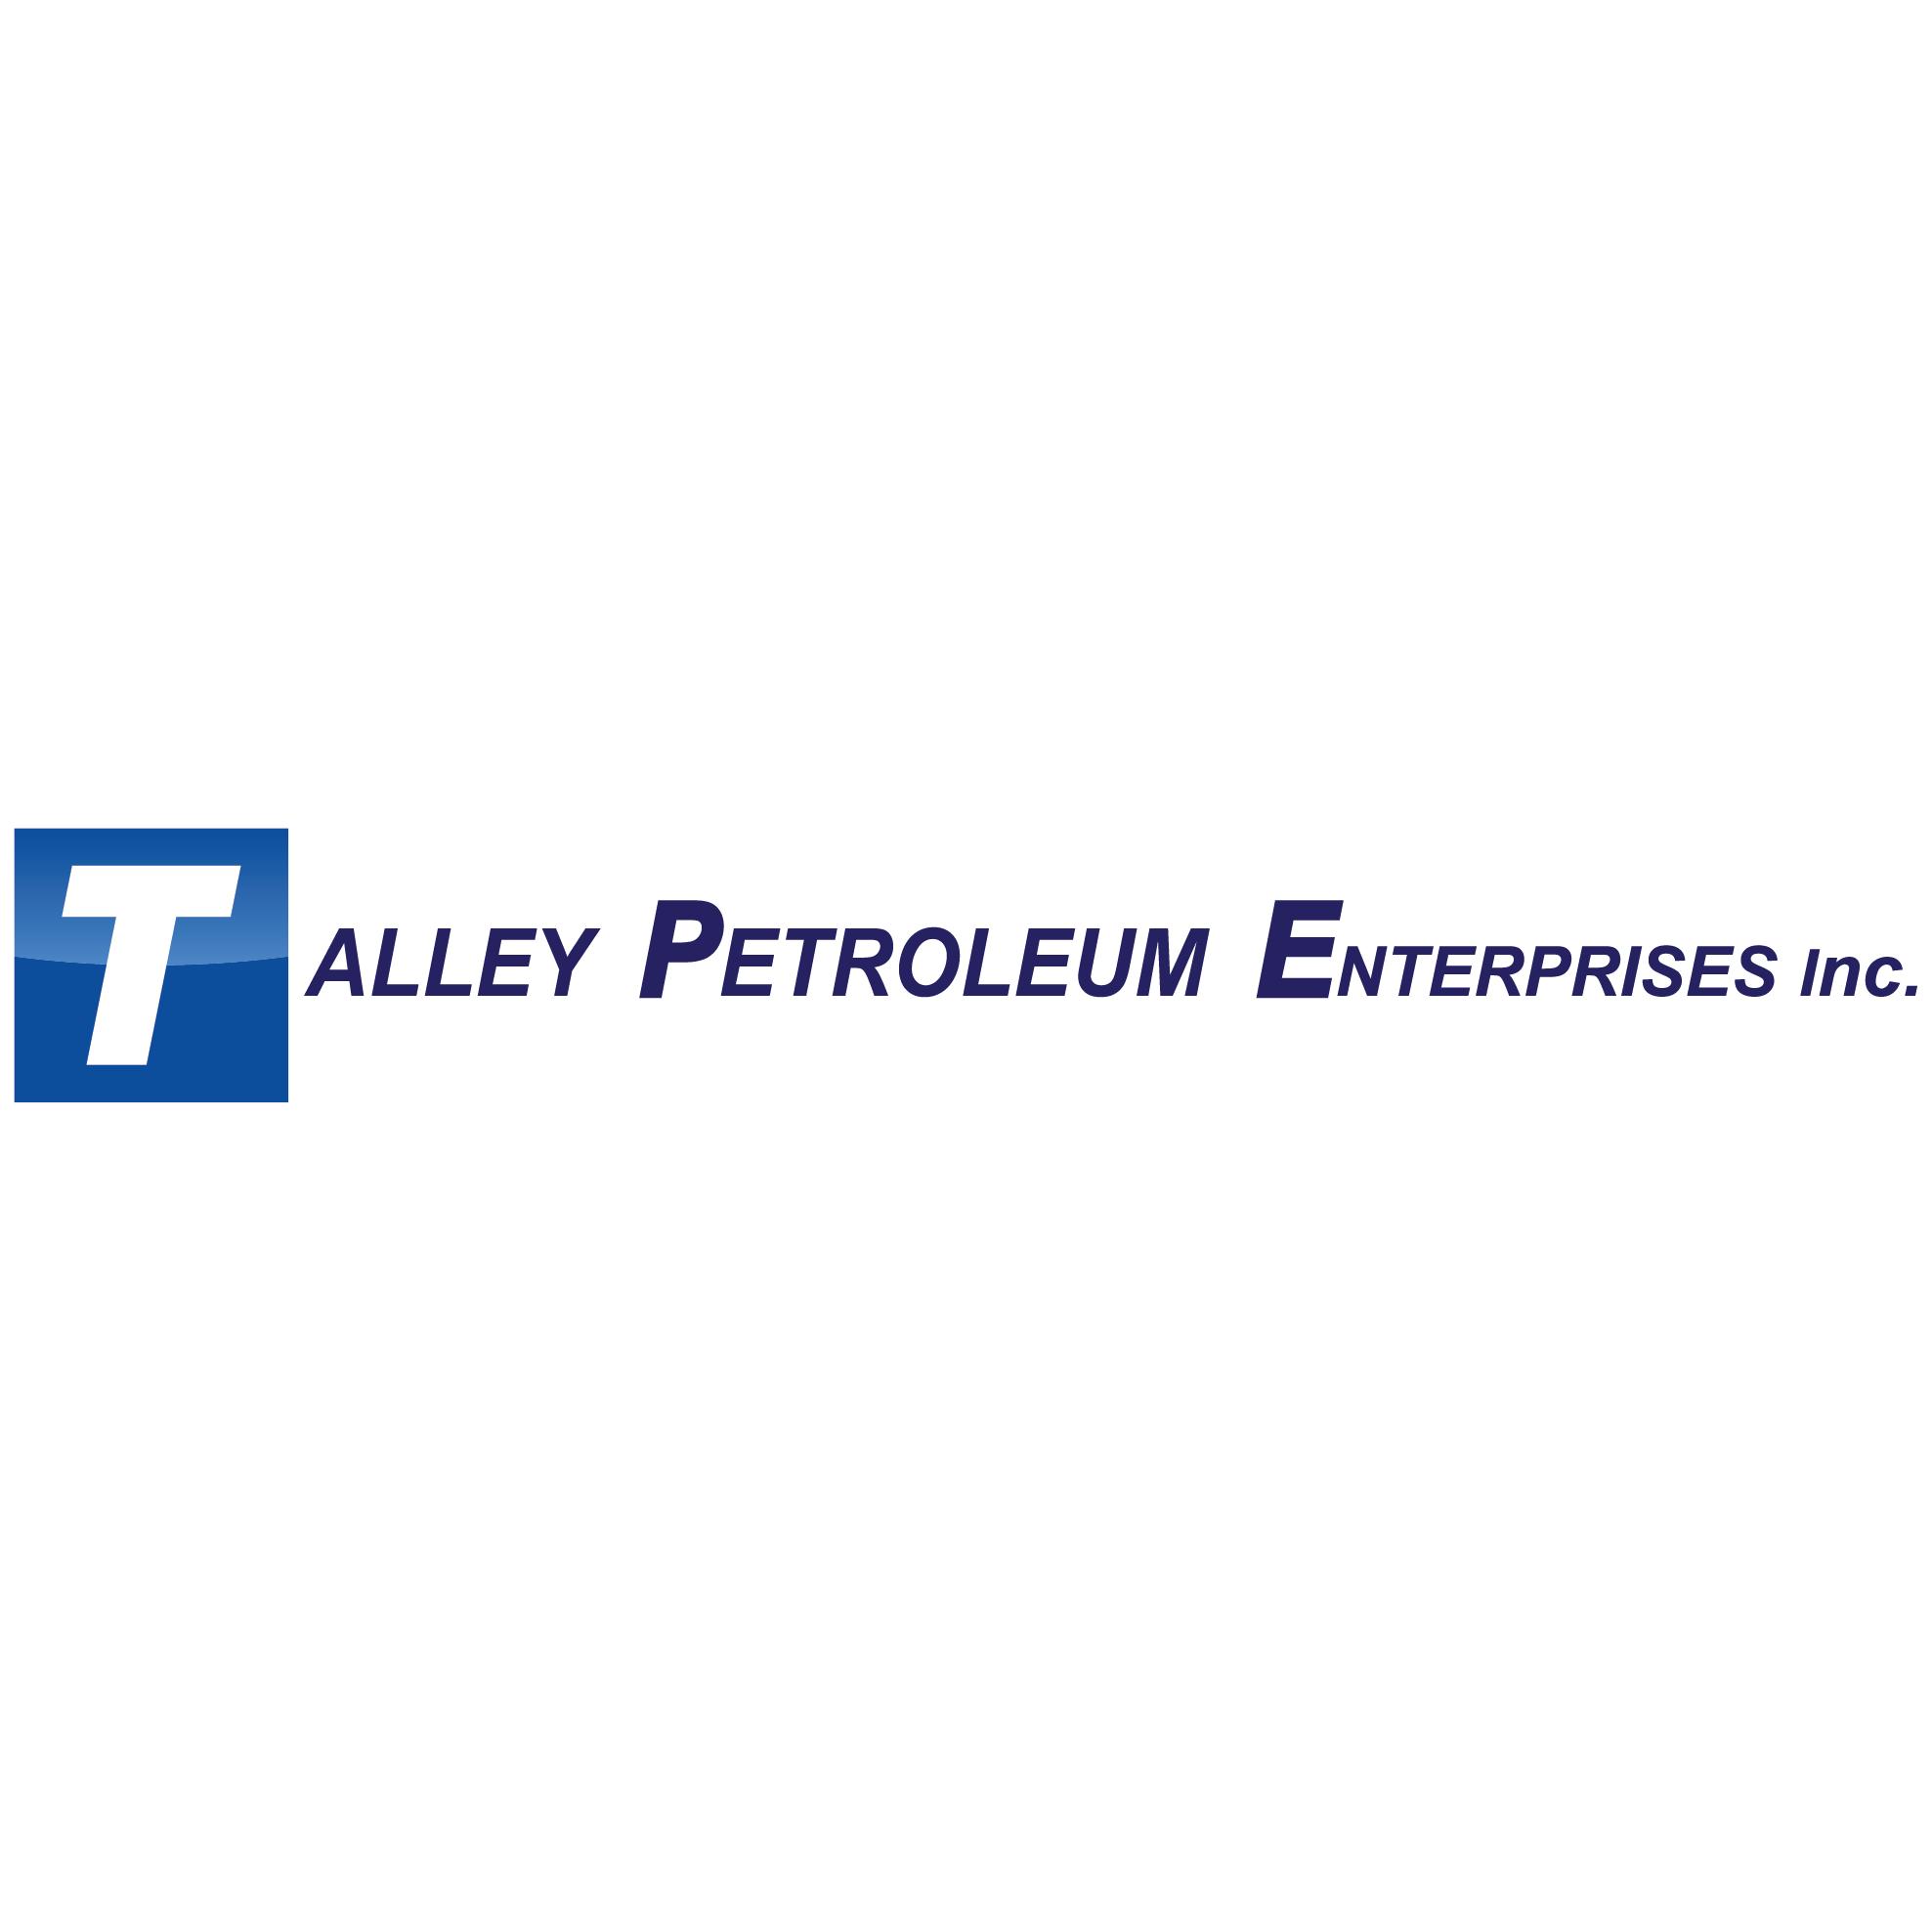 Talley Petroleum Enterprises Inc.